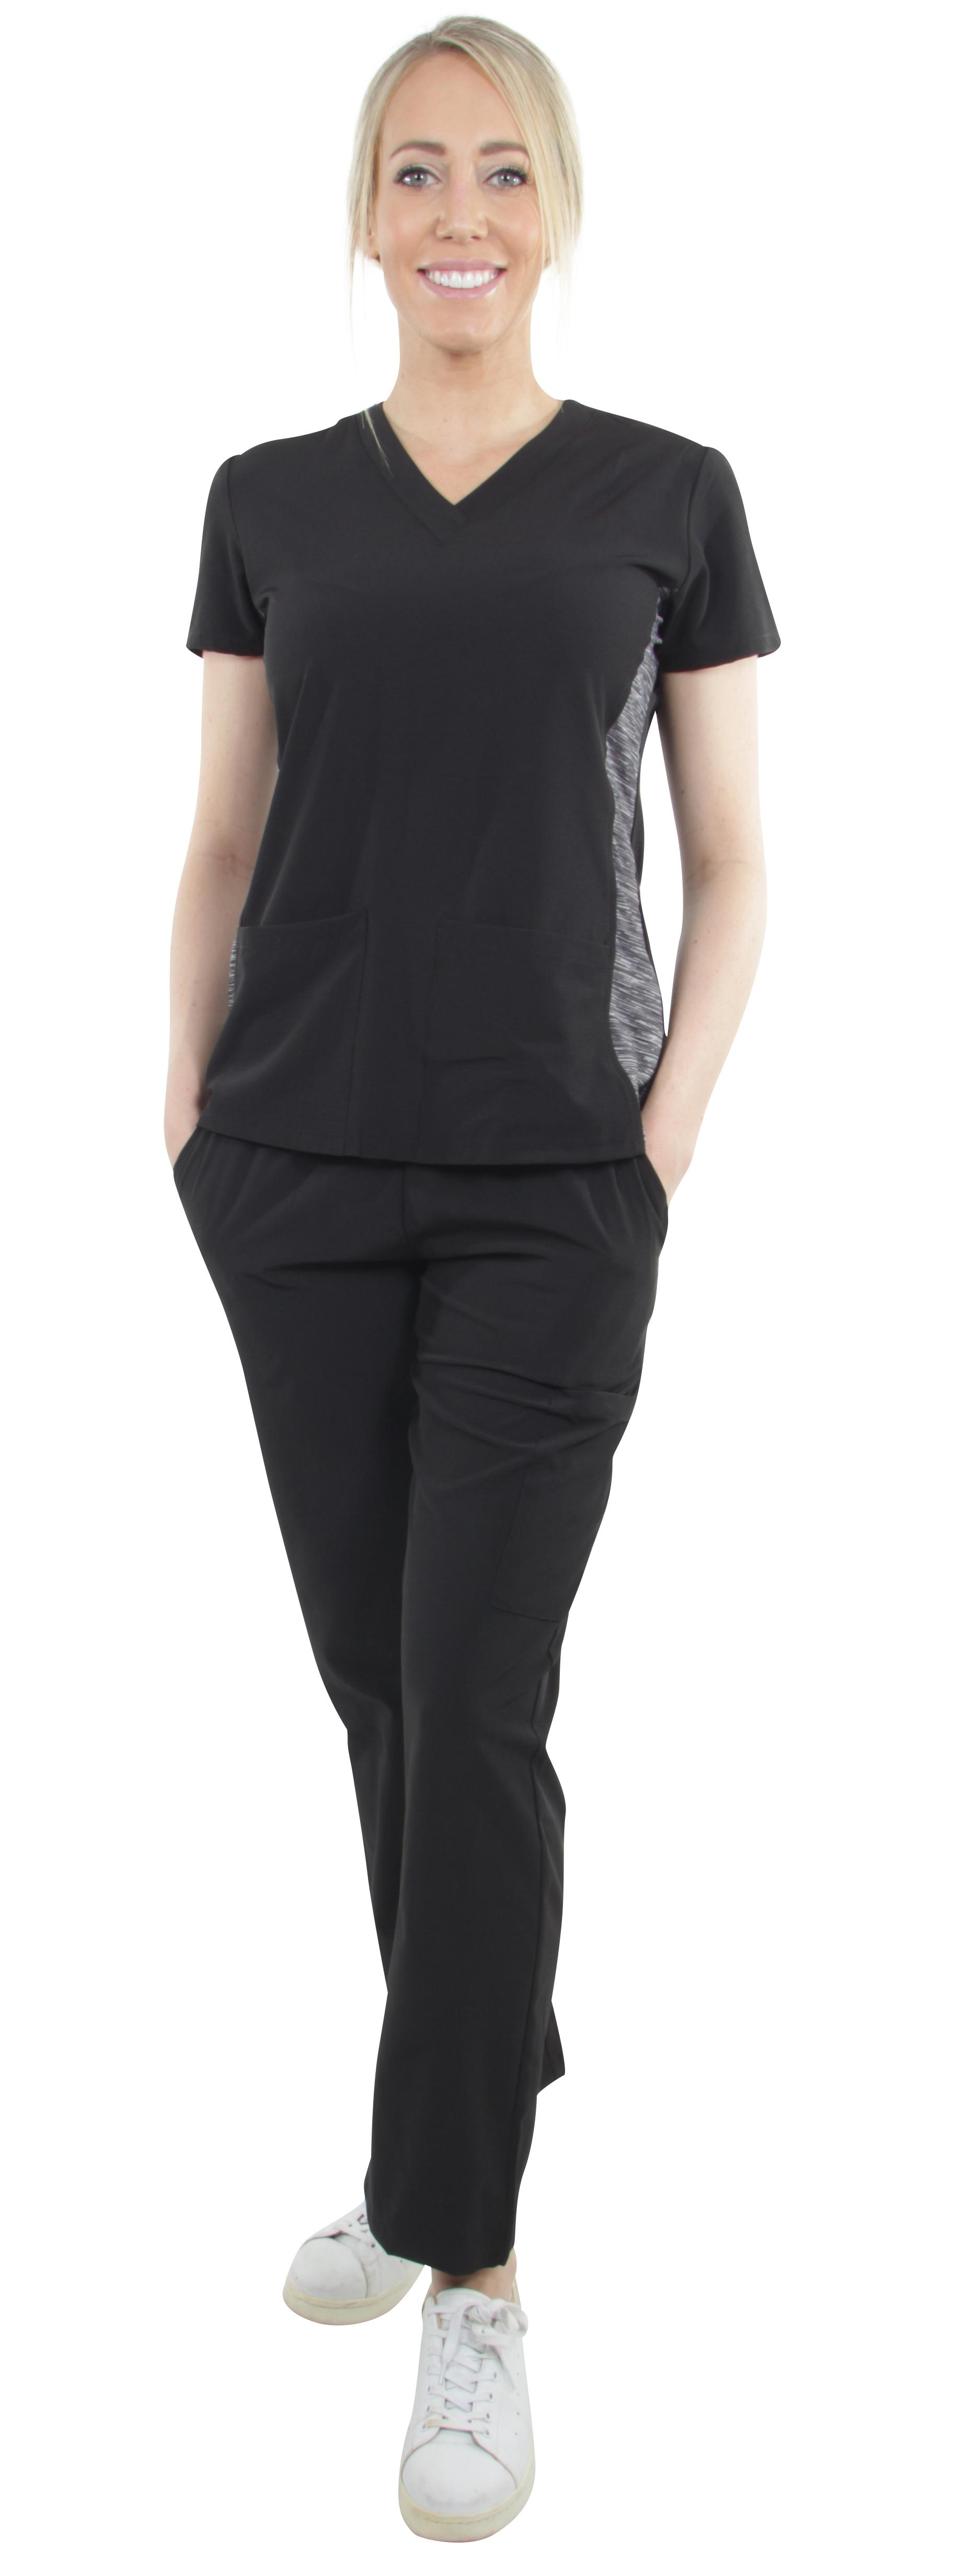 Unisex-Performance-Stretch-Medical-Uniform-Five-Pockets-V-Neck-Scrubs-Sets miniature 13